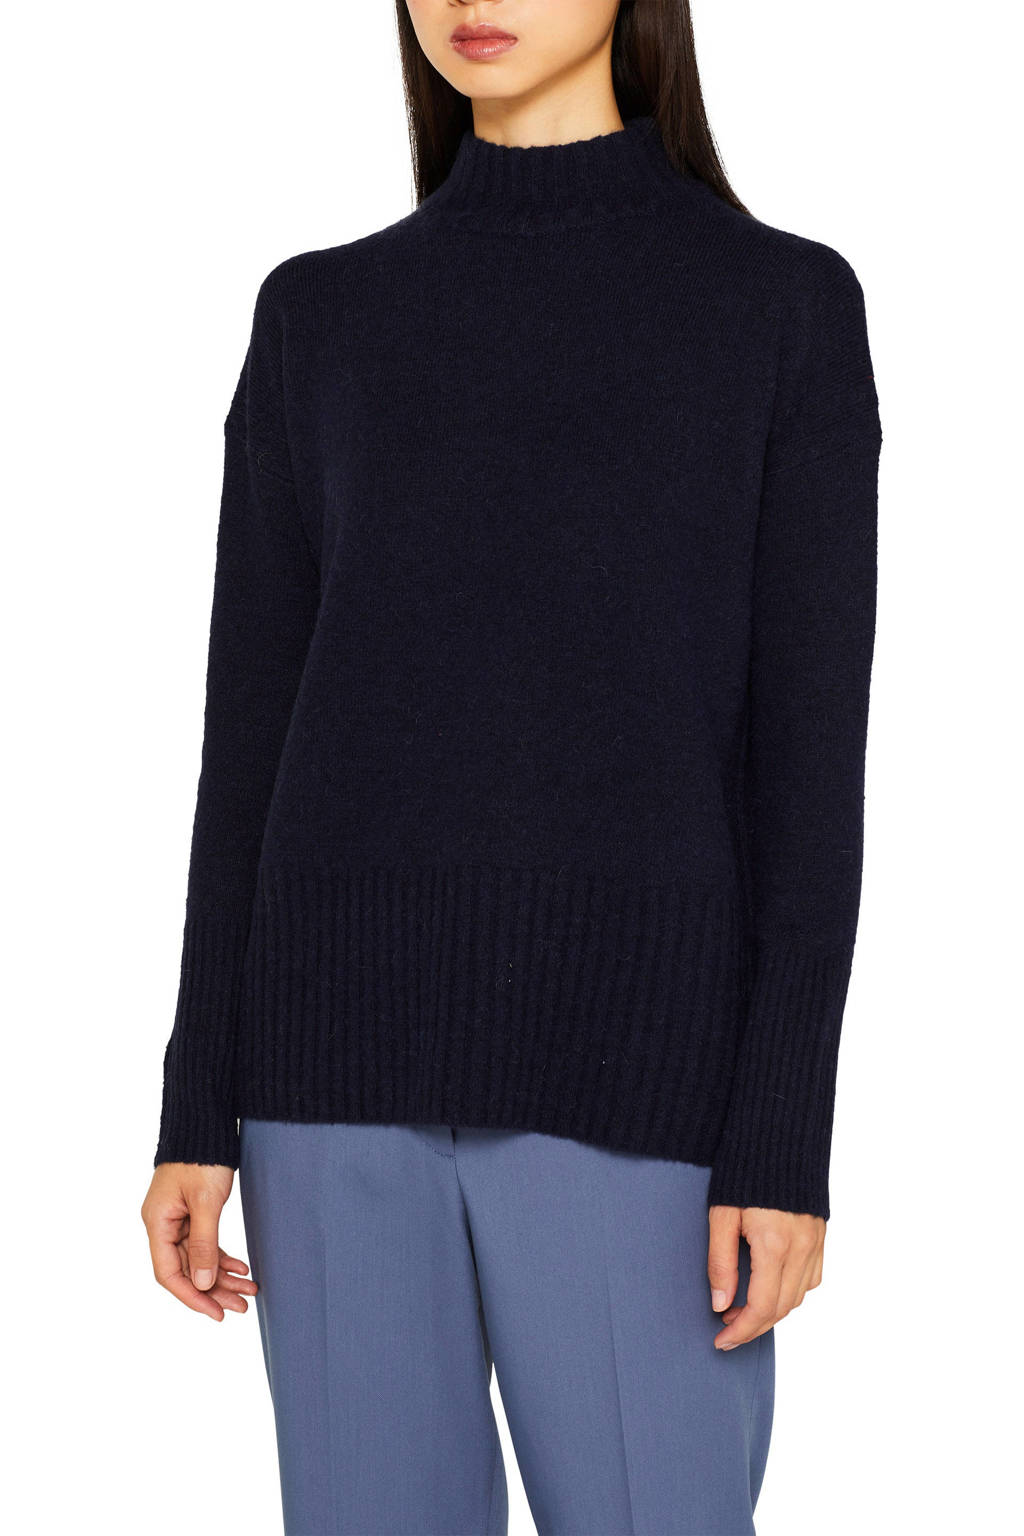 ESPRIT Women Casual trui met wol donkerblauw, Donkerblauw